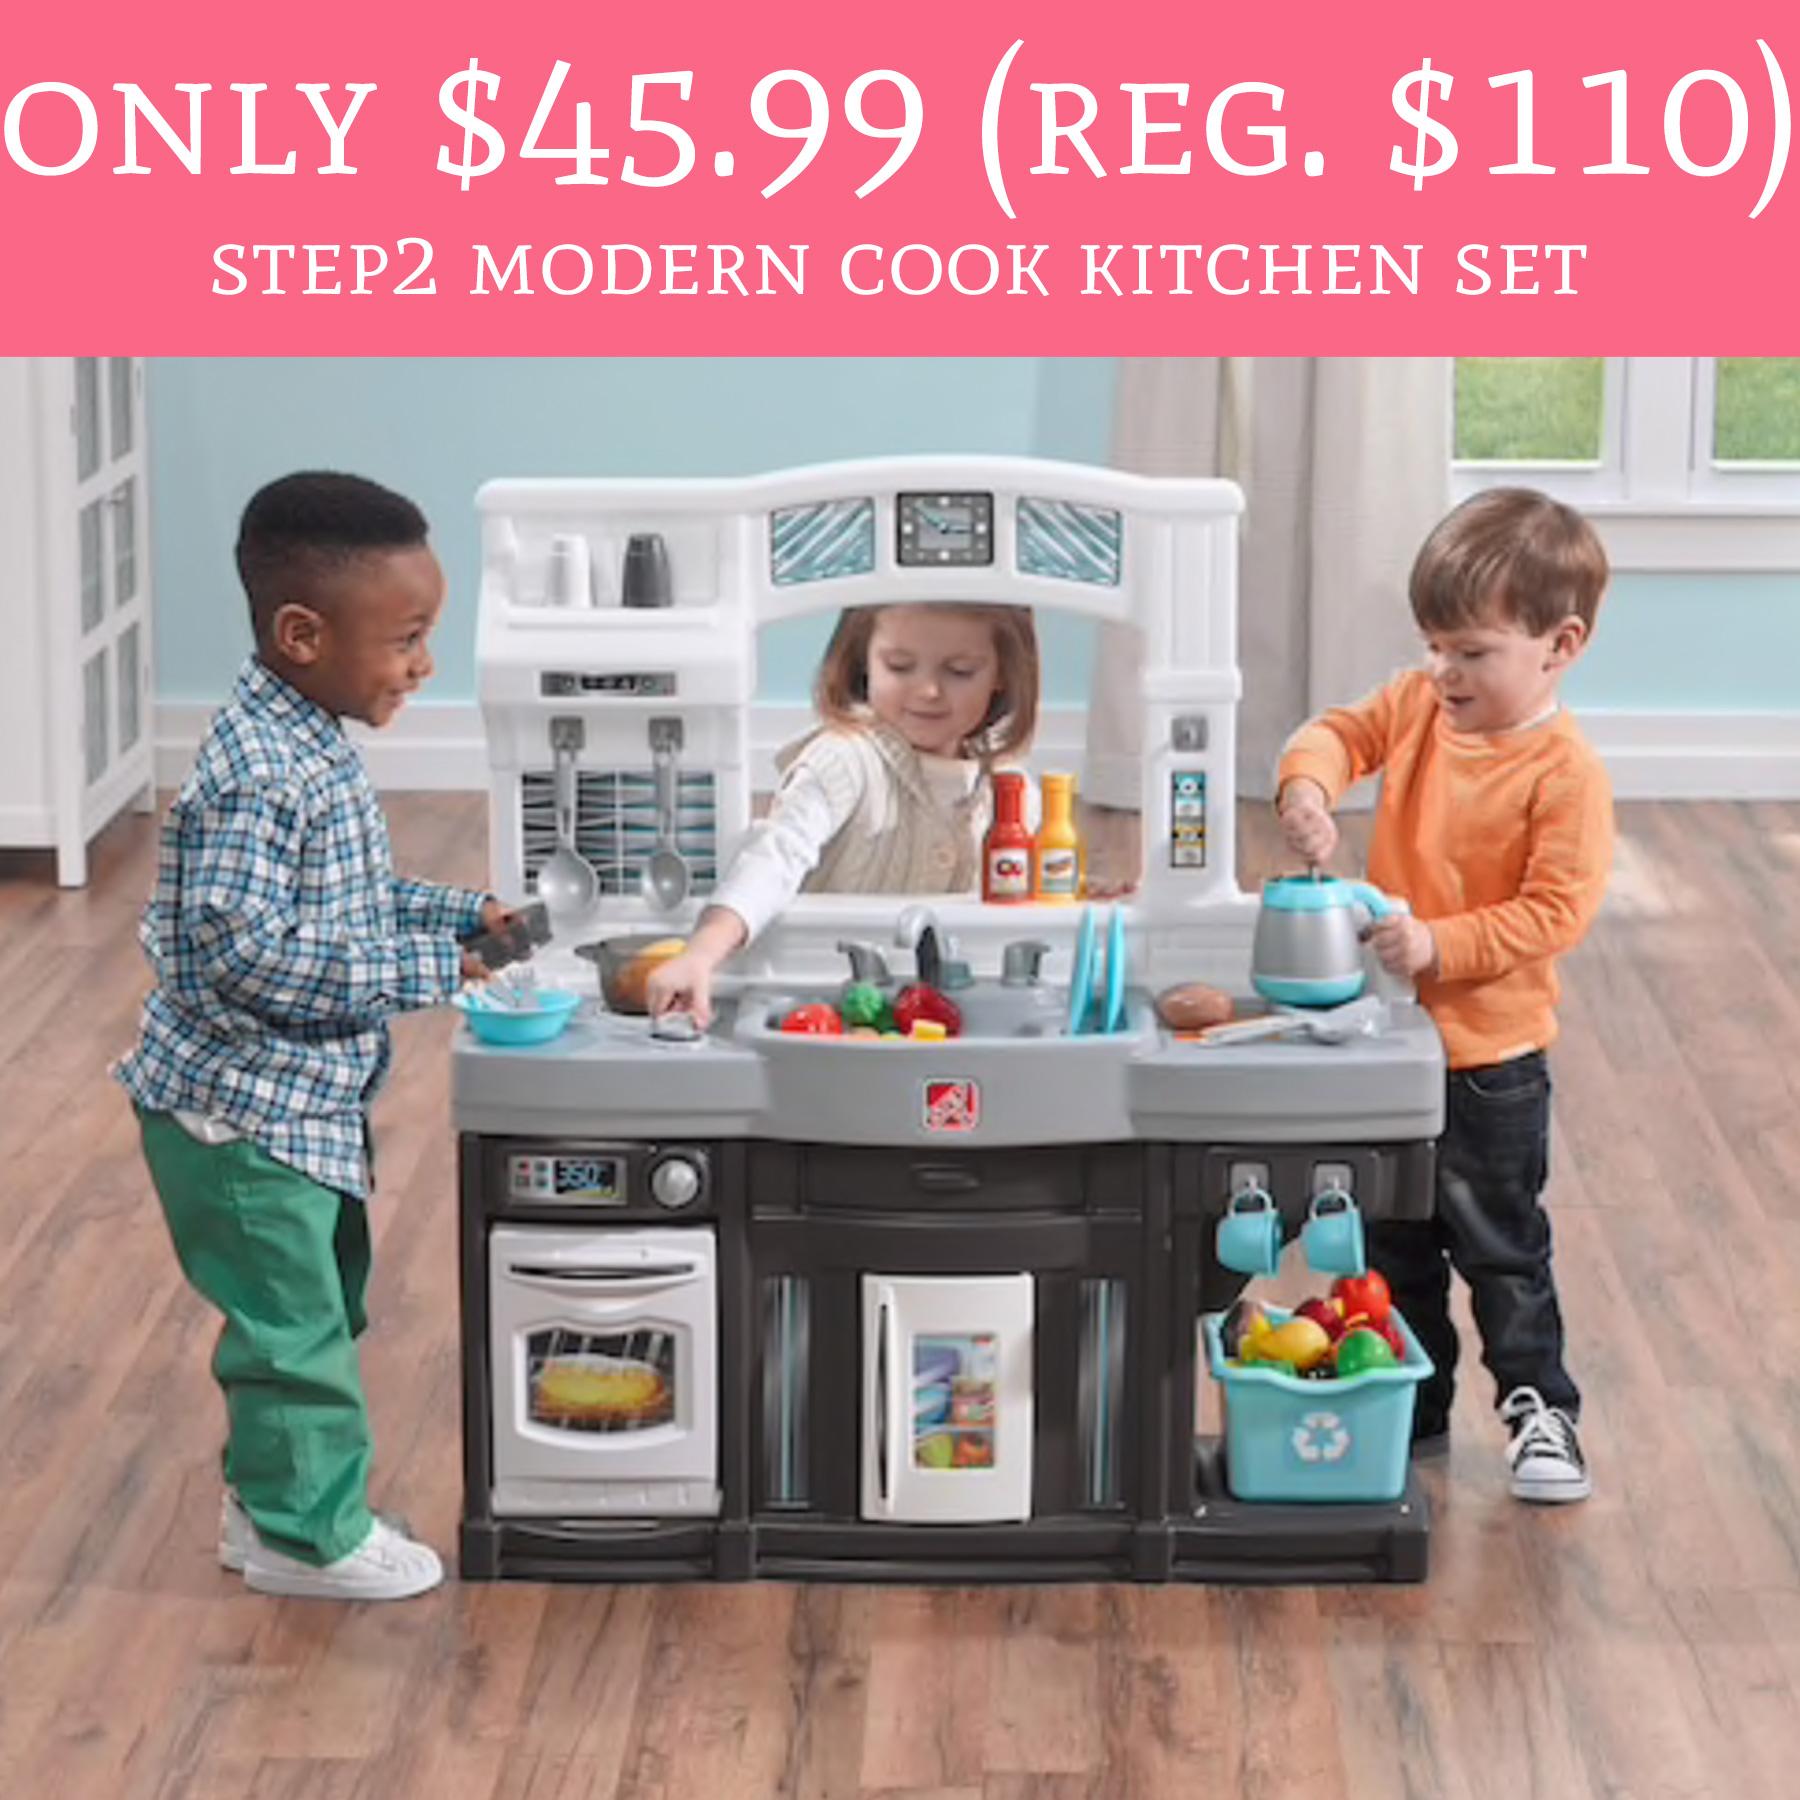 Only regular 110 step2 modern cook kitchen set for Kitchen set list